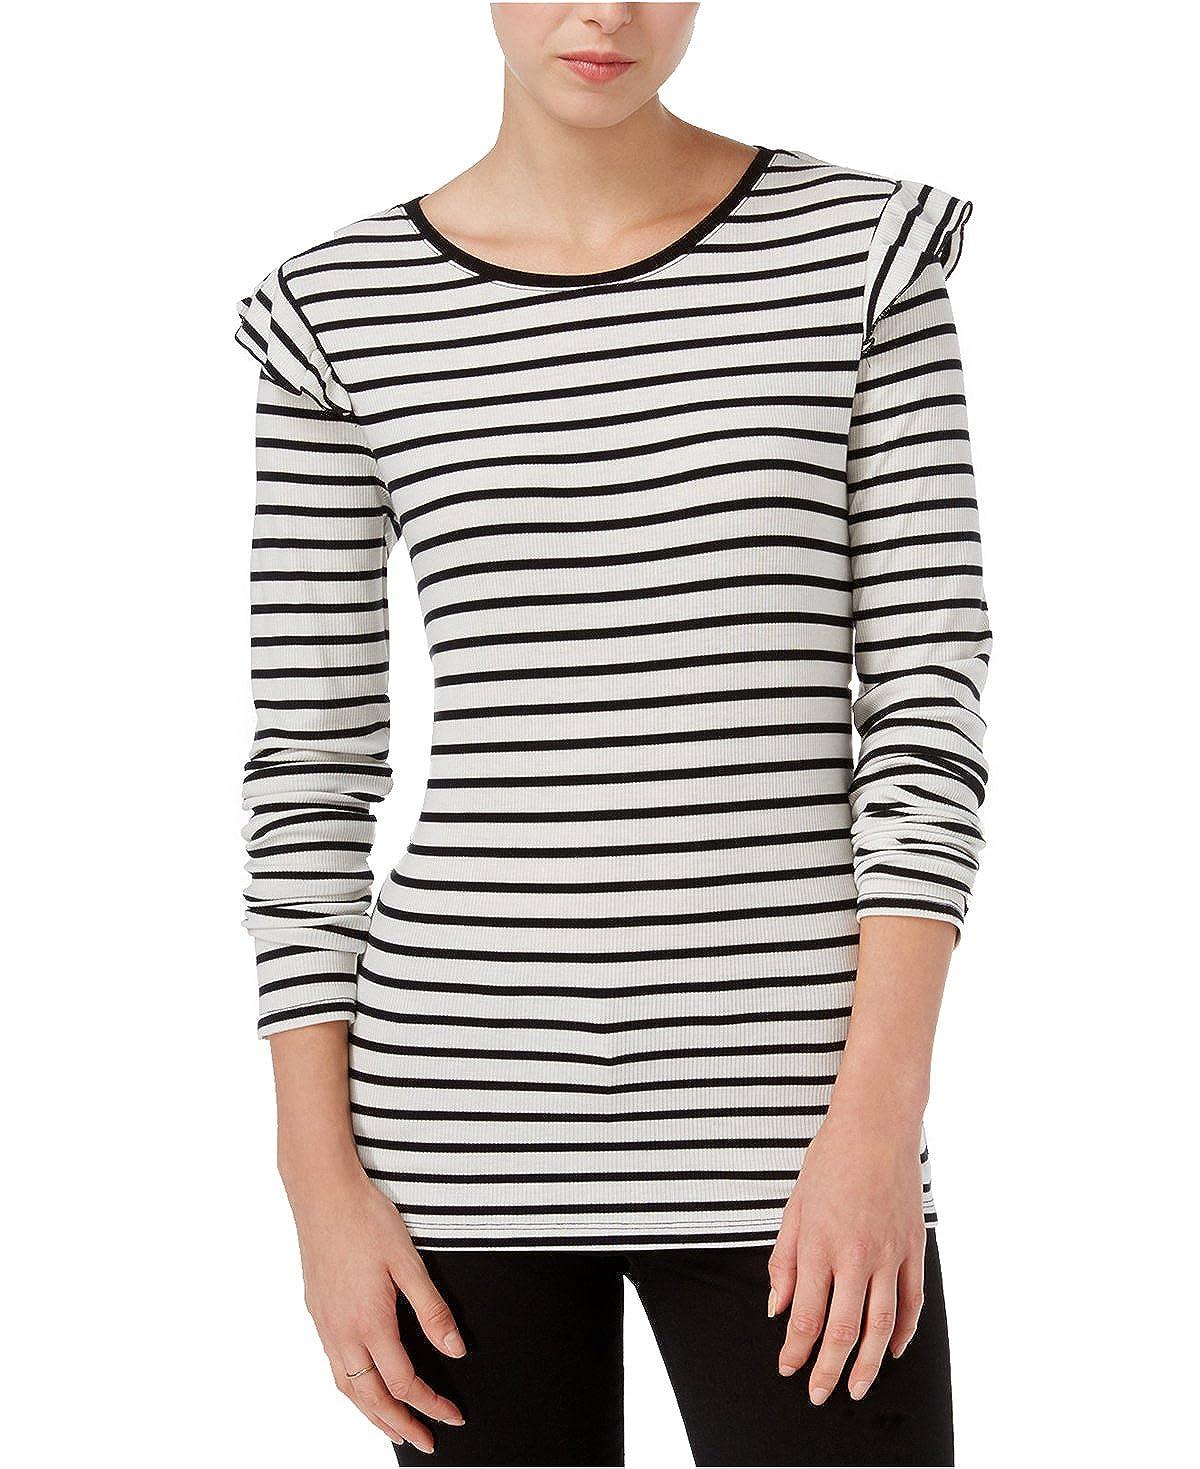 Alfani Maison Jules Women s Long-Sleeve Striped Ruffled Top c56fef250